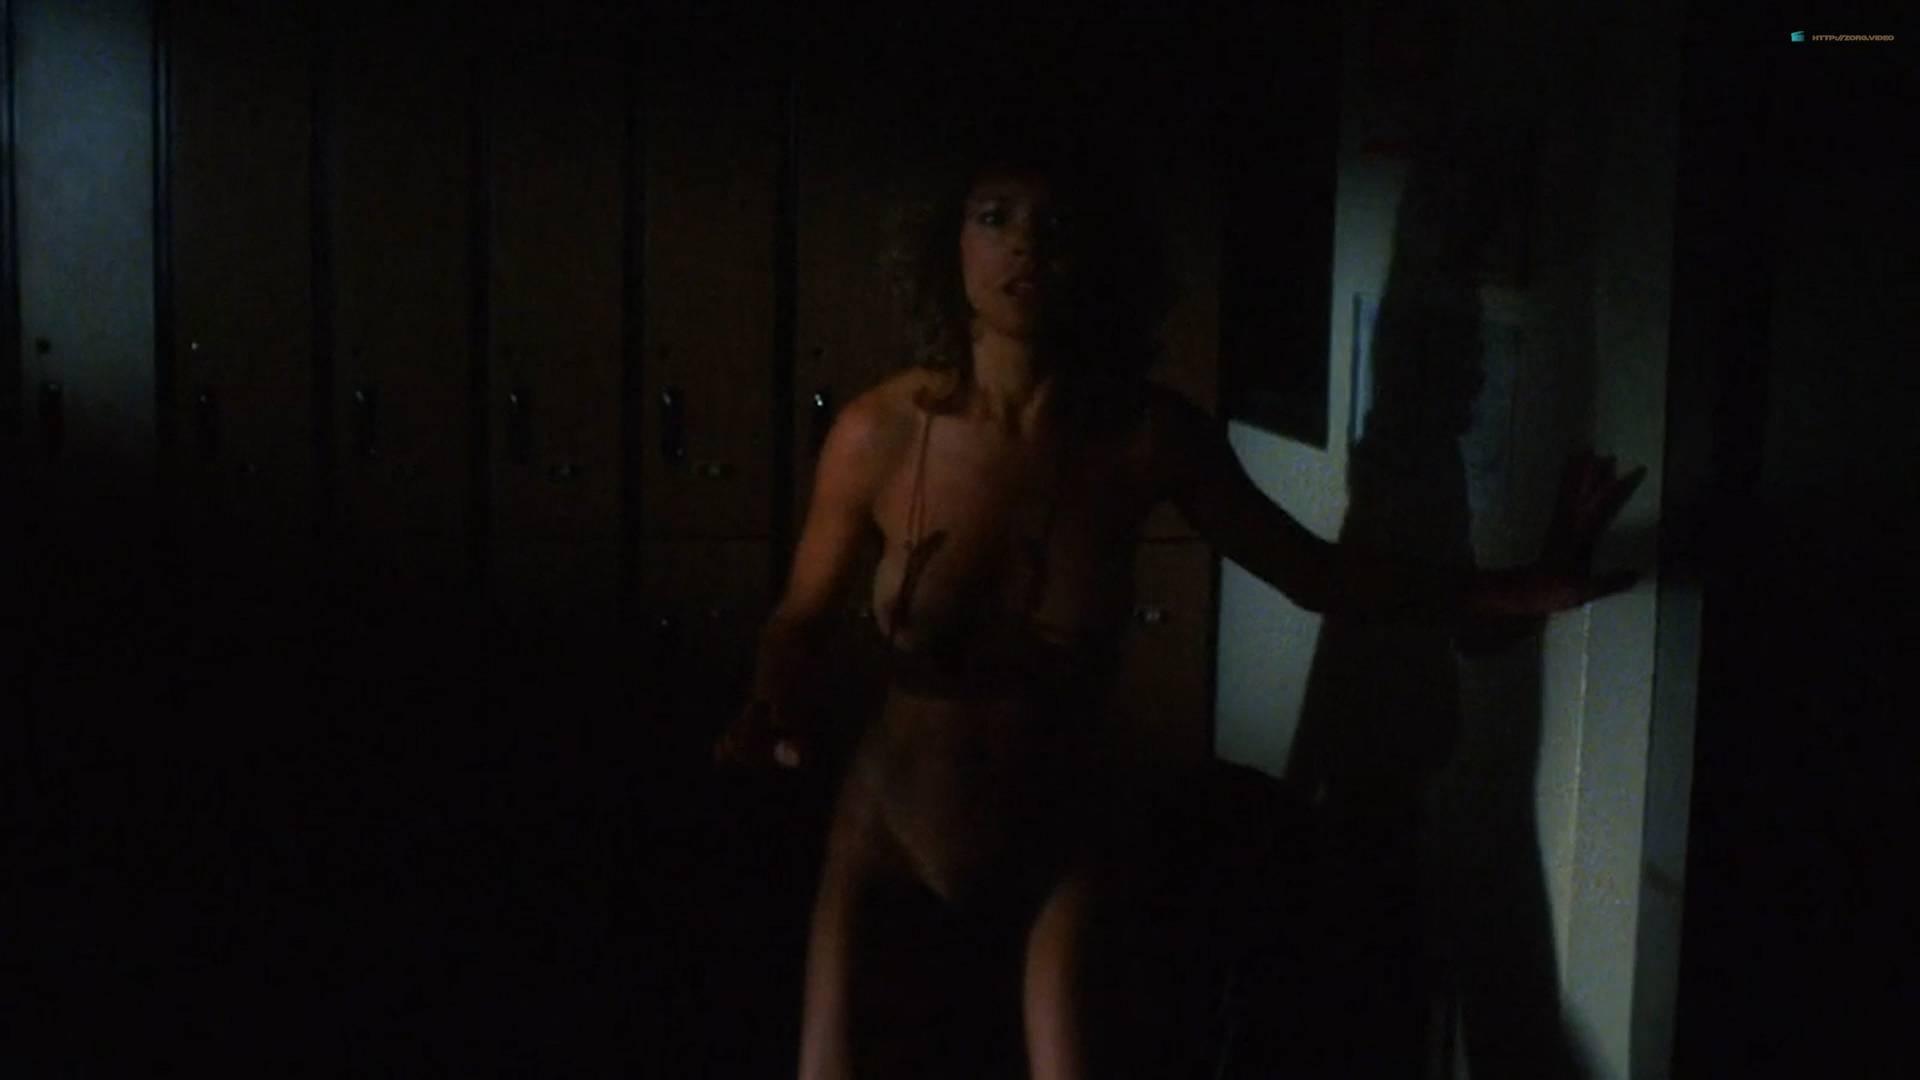 Brinke Stevens nude full frontal Michelle Bauer nude sex - Sorority Babes in the Slimeball Bowl-O-Rama (1988) HD 1080p (4)